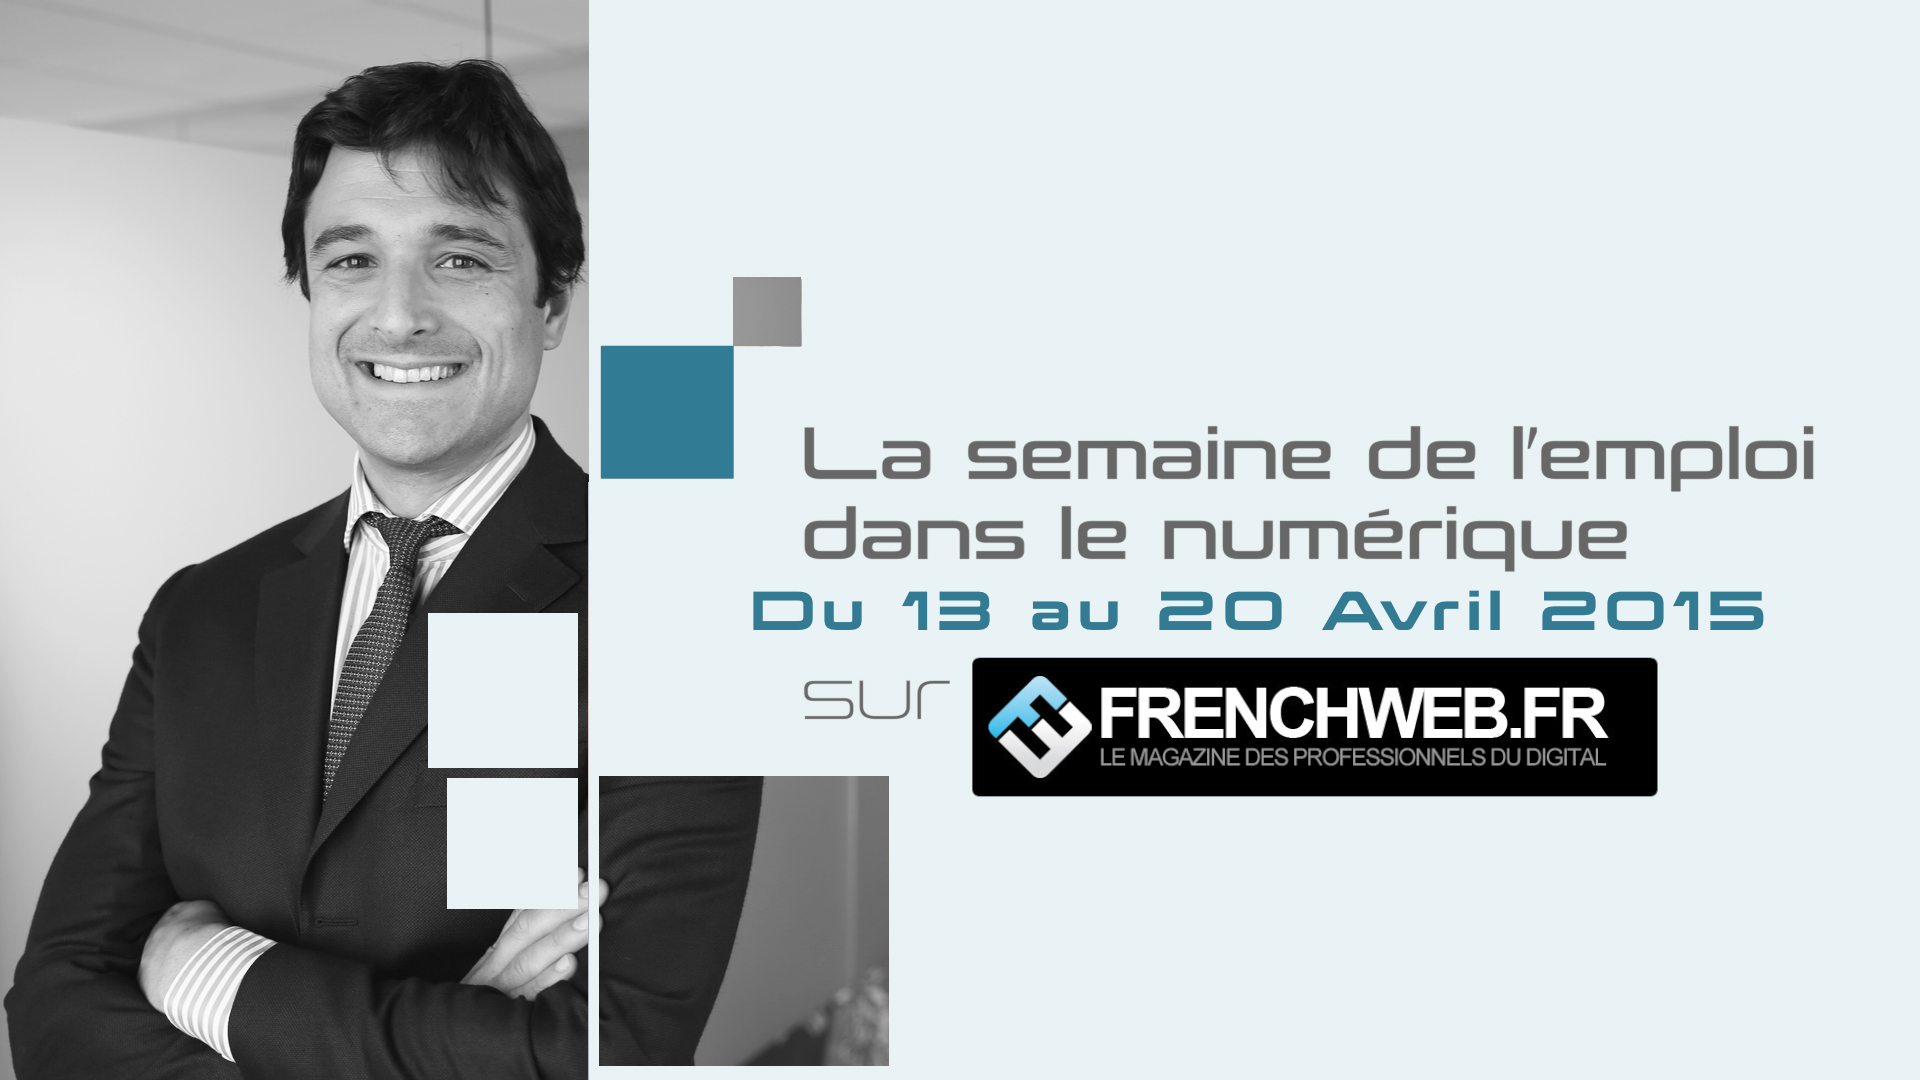 FrenchWeb_senfw3